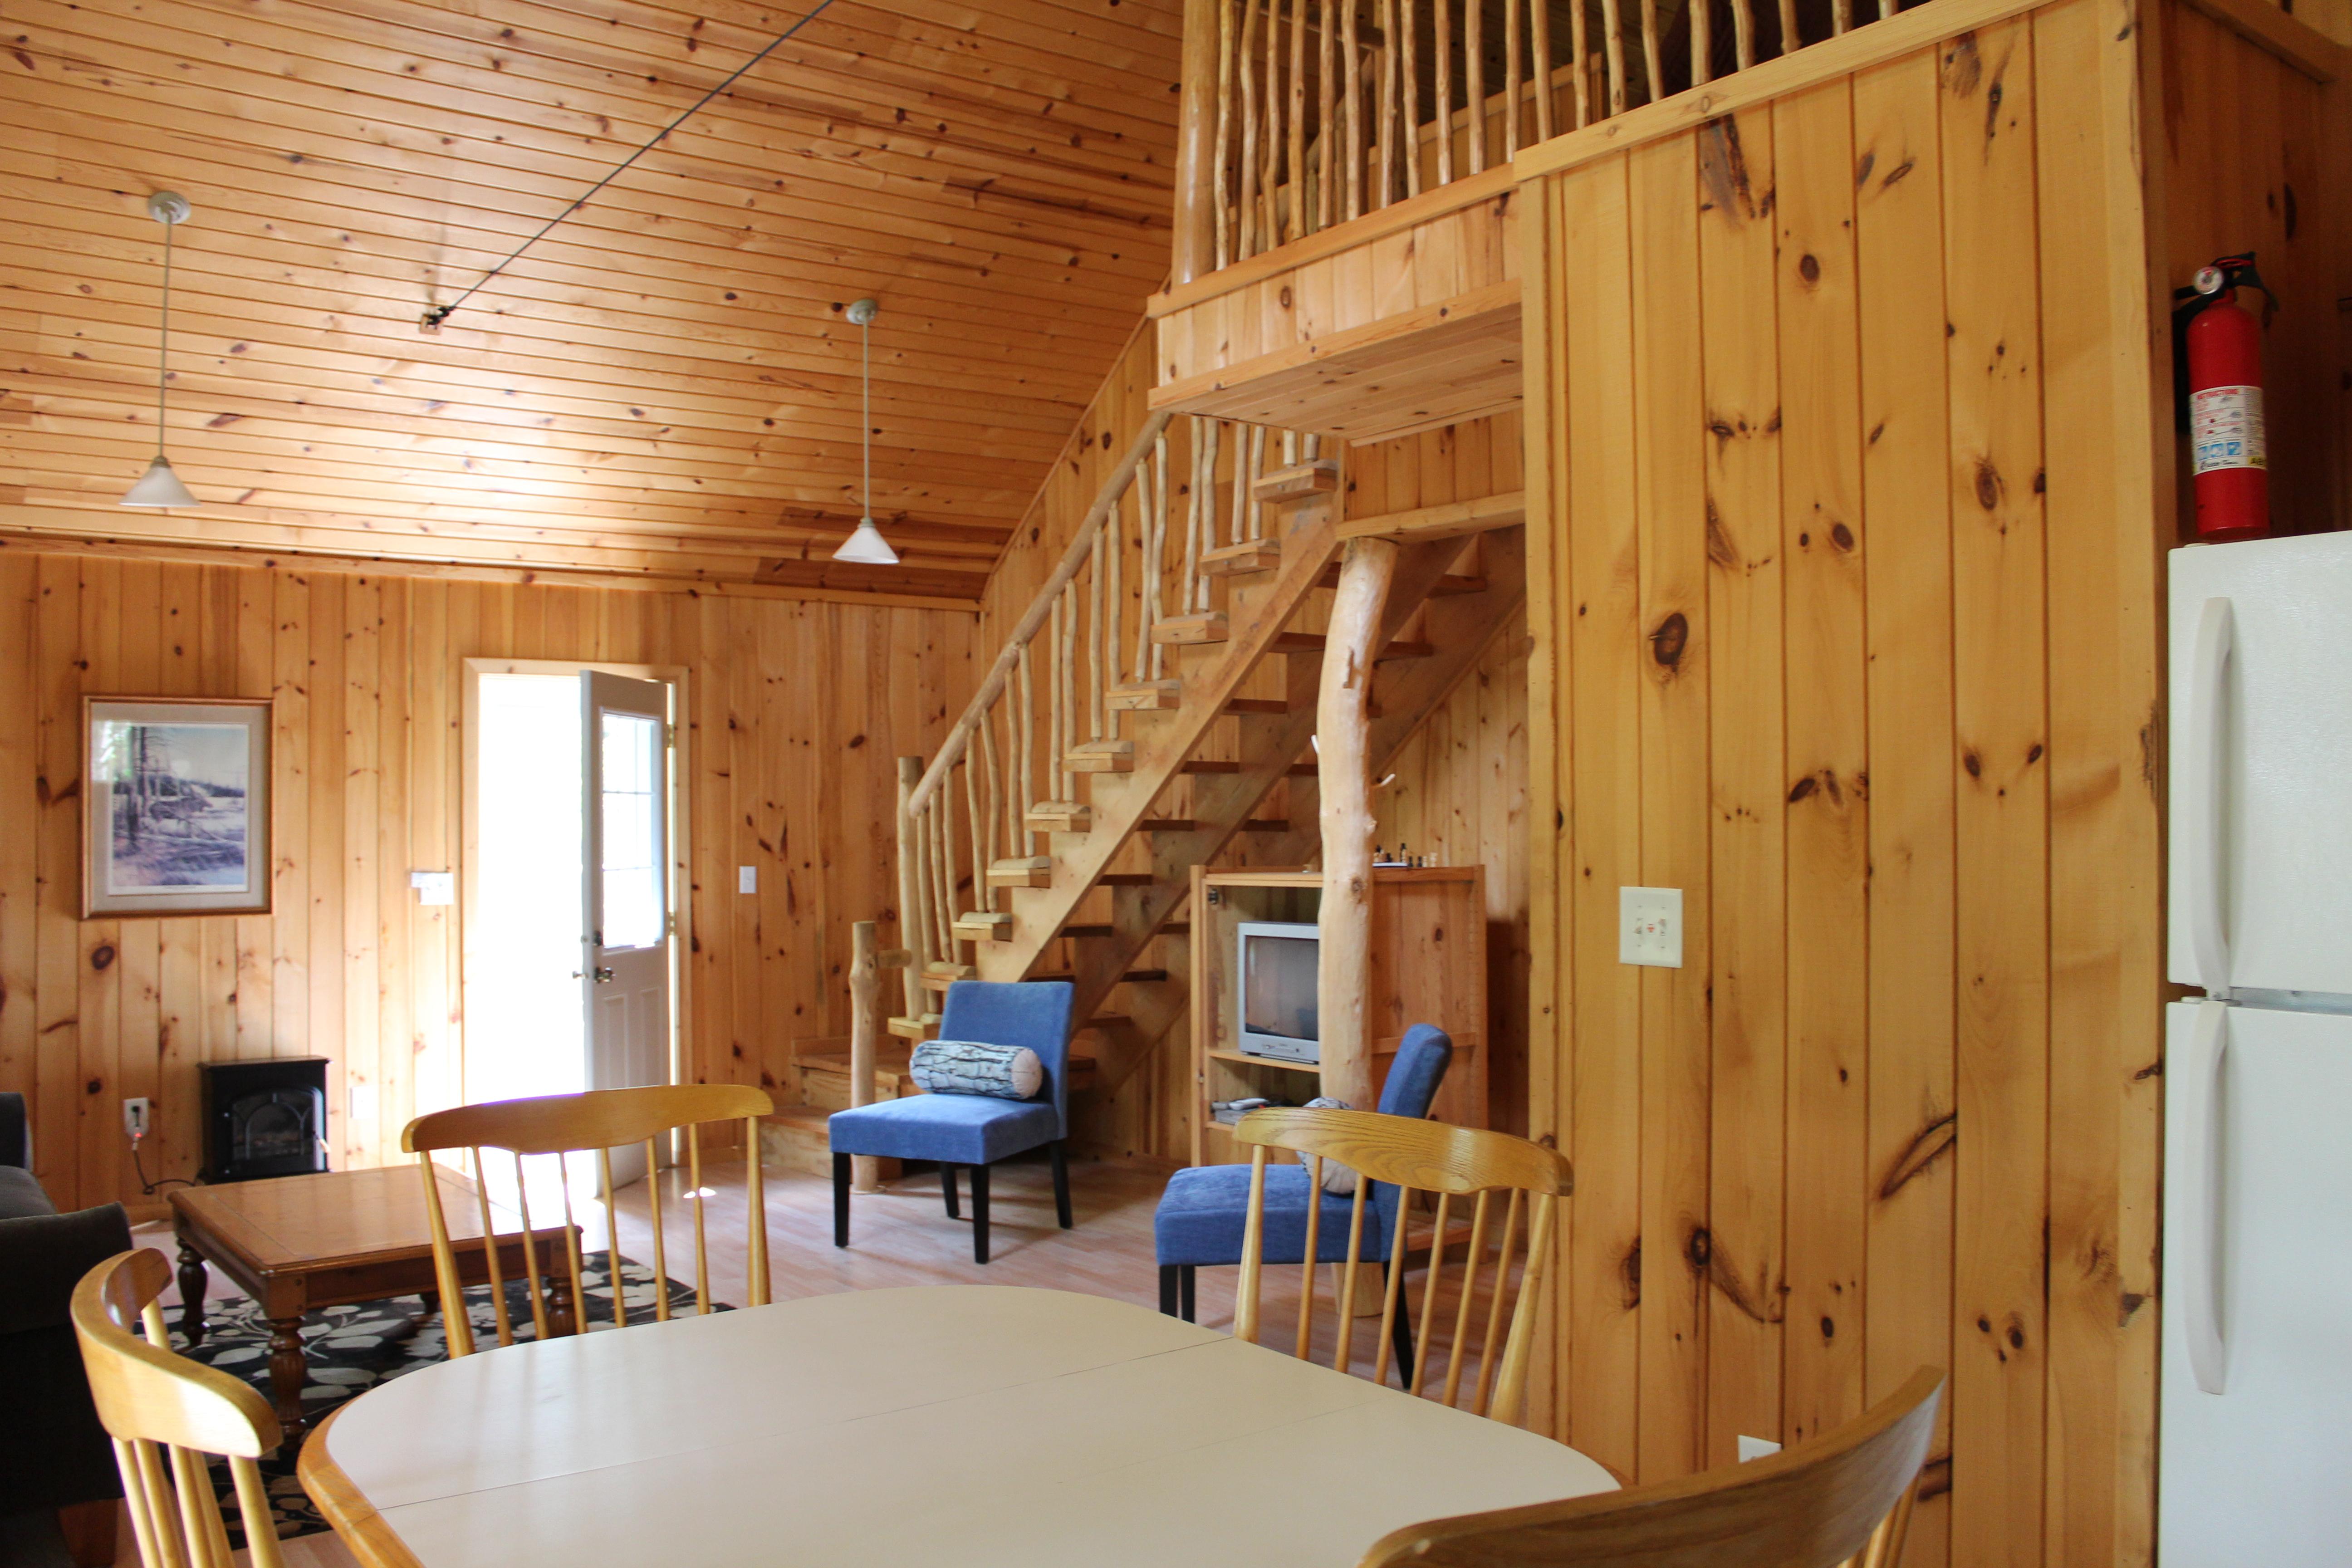 cabins hocking hills great bourbon retreat and lodges luxury room ohio ridge lodge home in